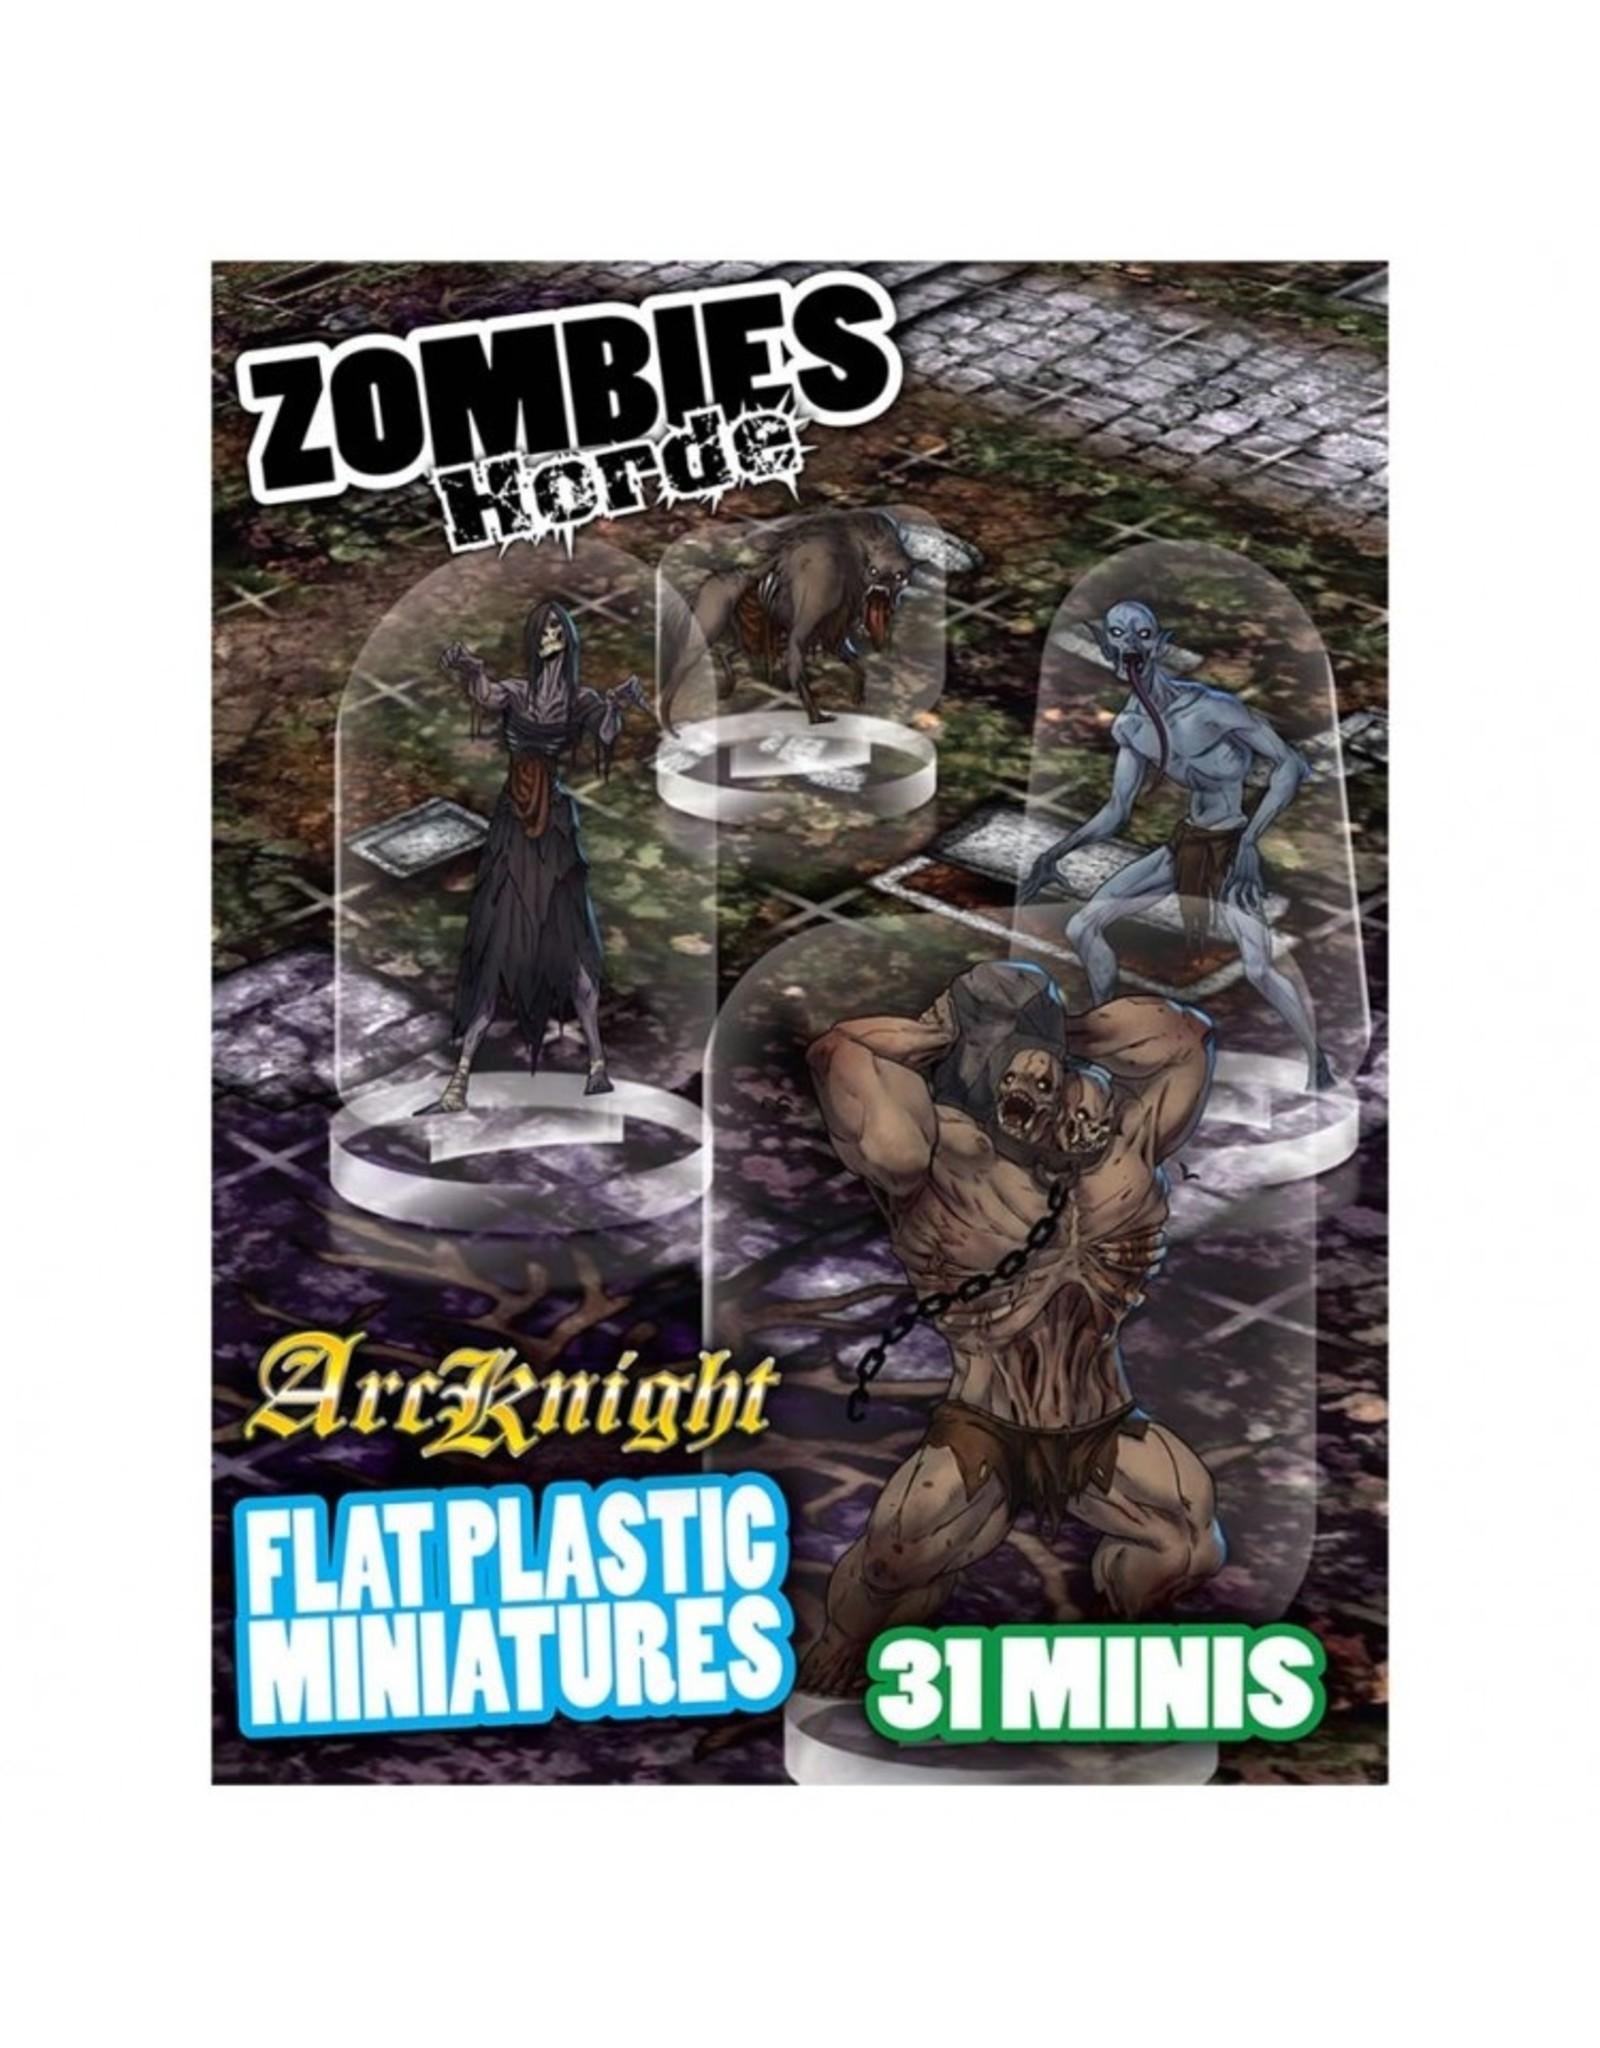 Arcknight Flat Plastic Miniatures: Zombies Horde